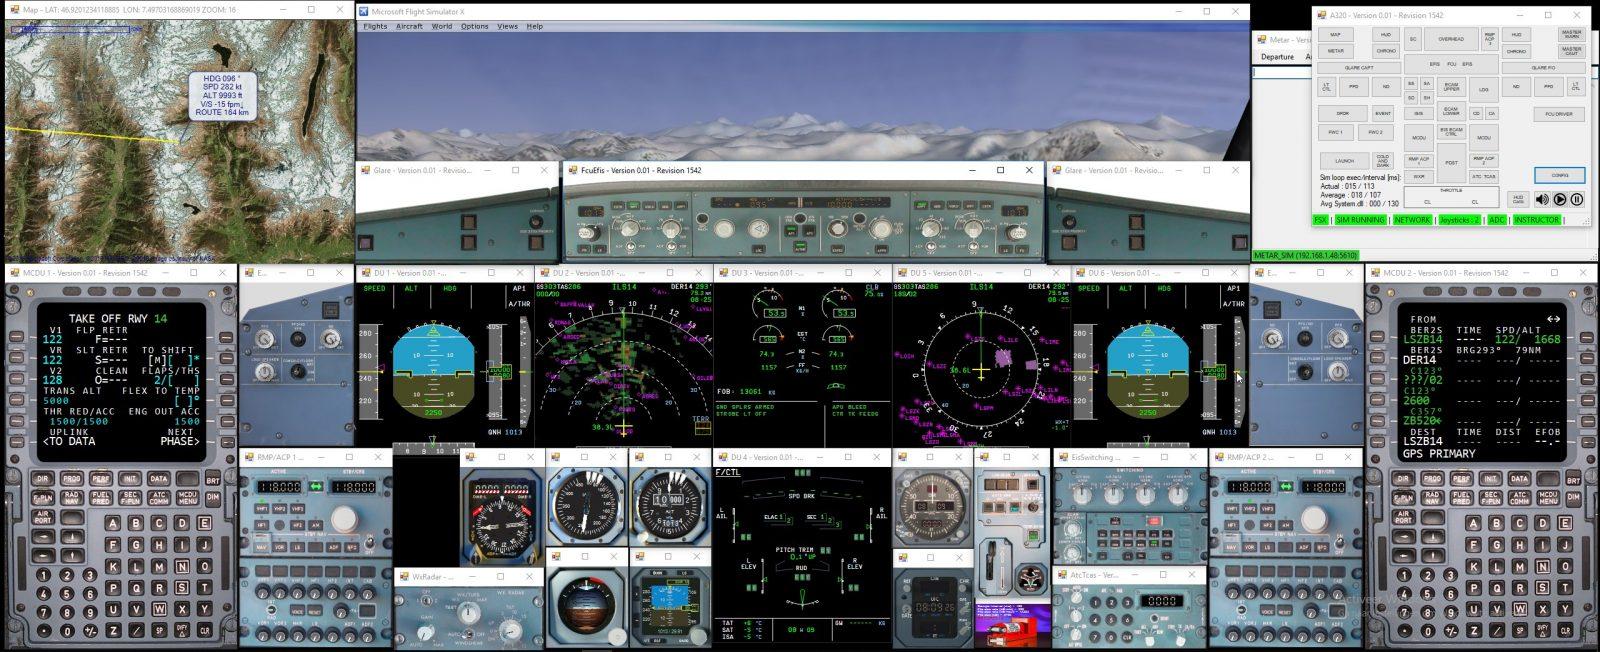 Flight above the Alps